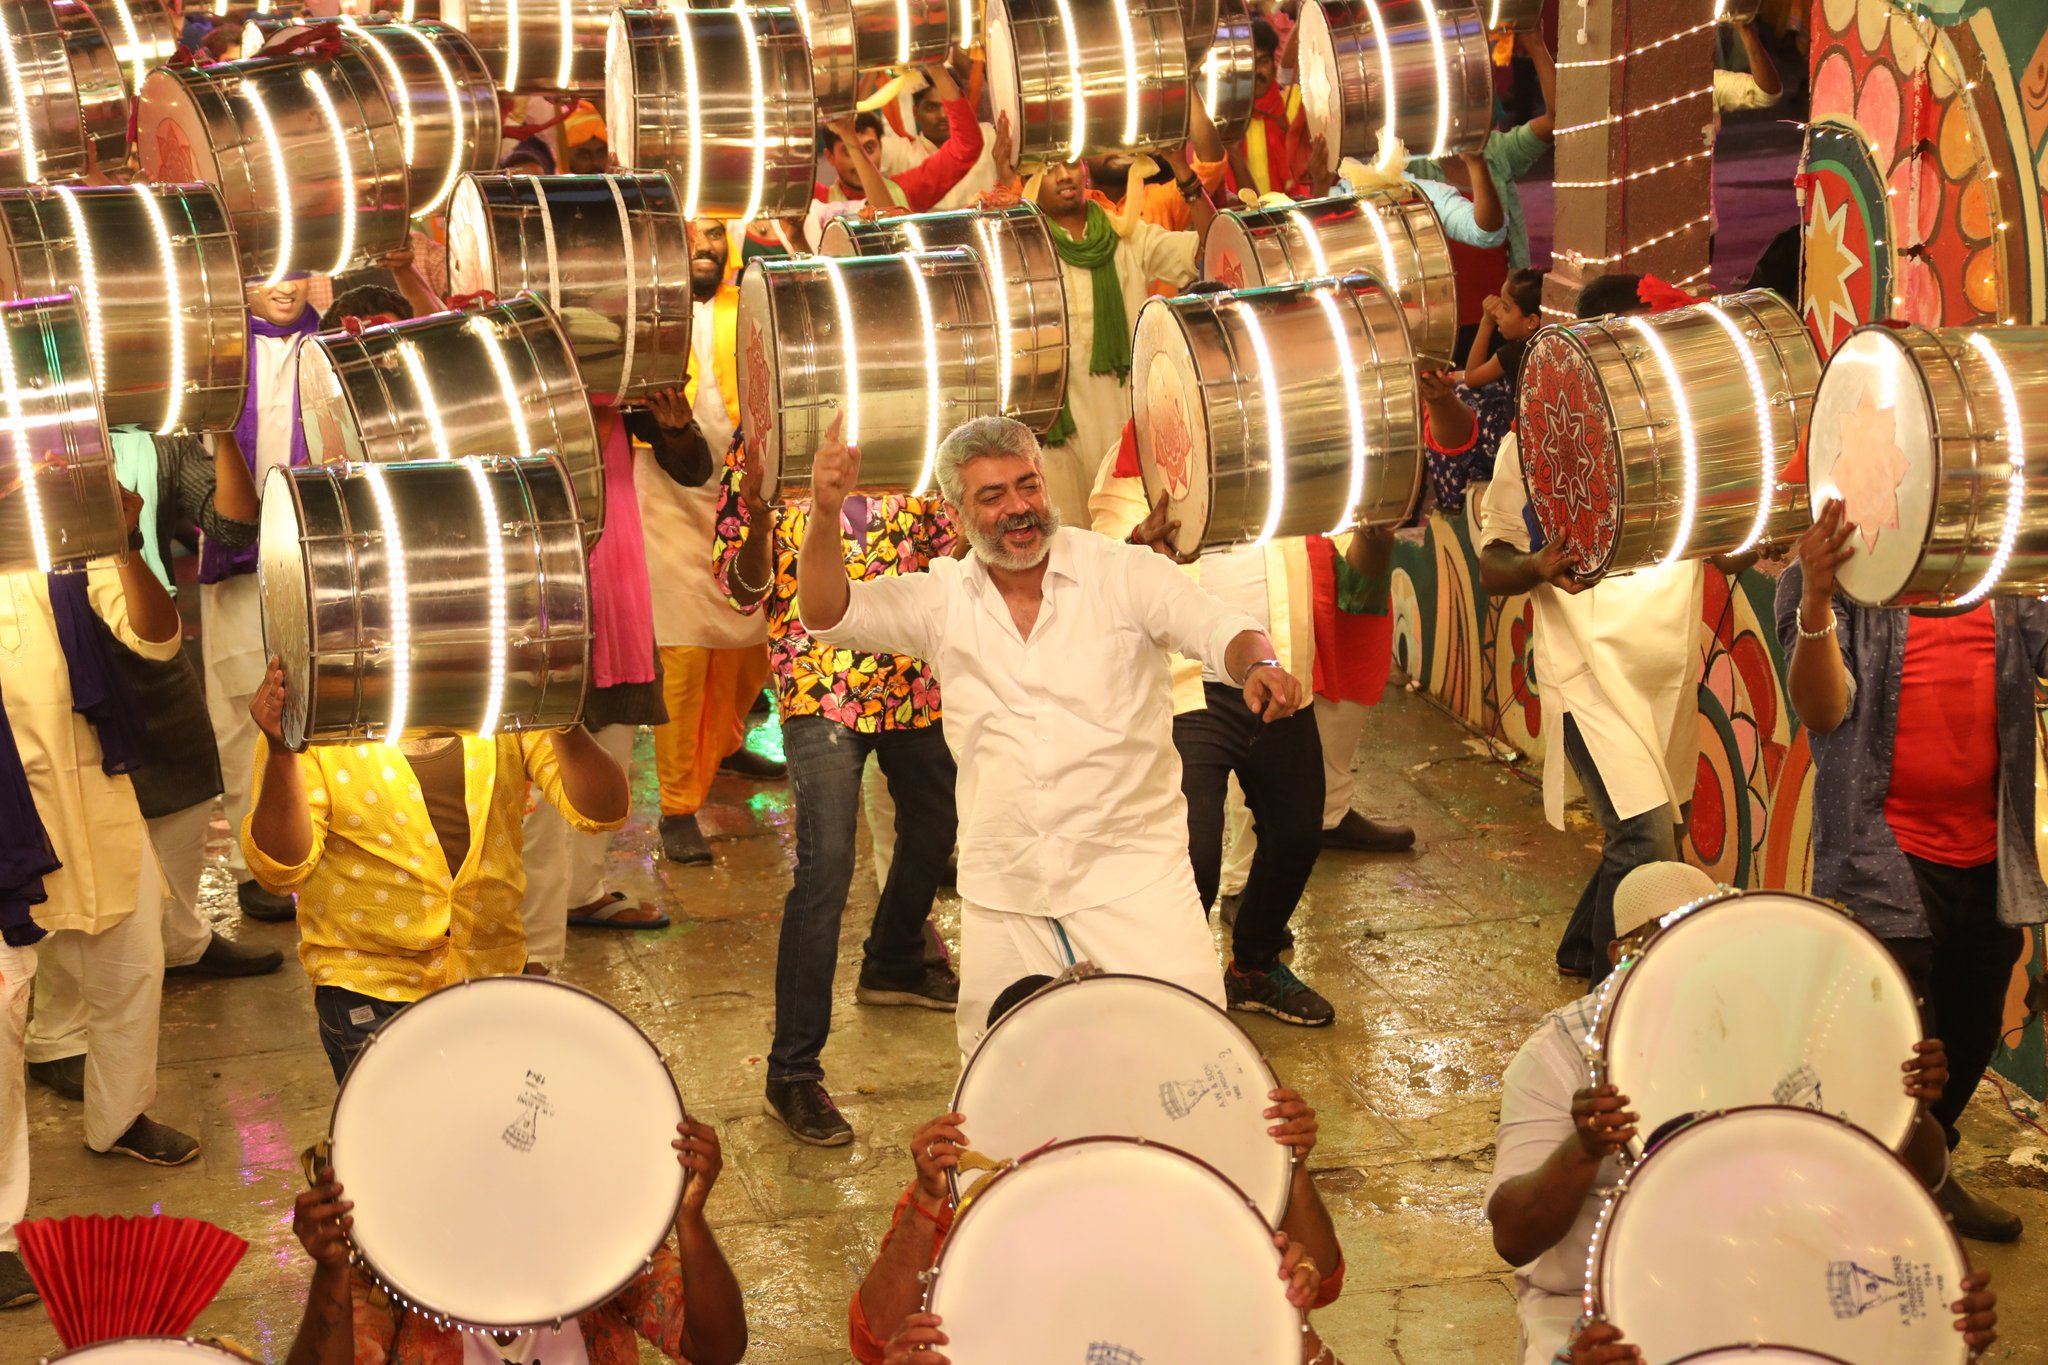 Zee Cine Awards Tamil 2020: Thala Ajith's Valimai to Release on Diwali 2020, Confirms Boney Kapoor!